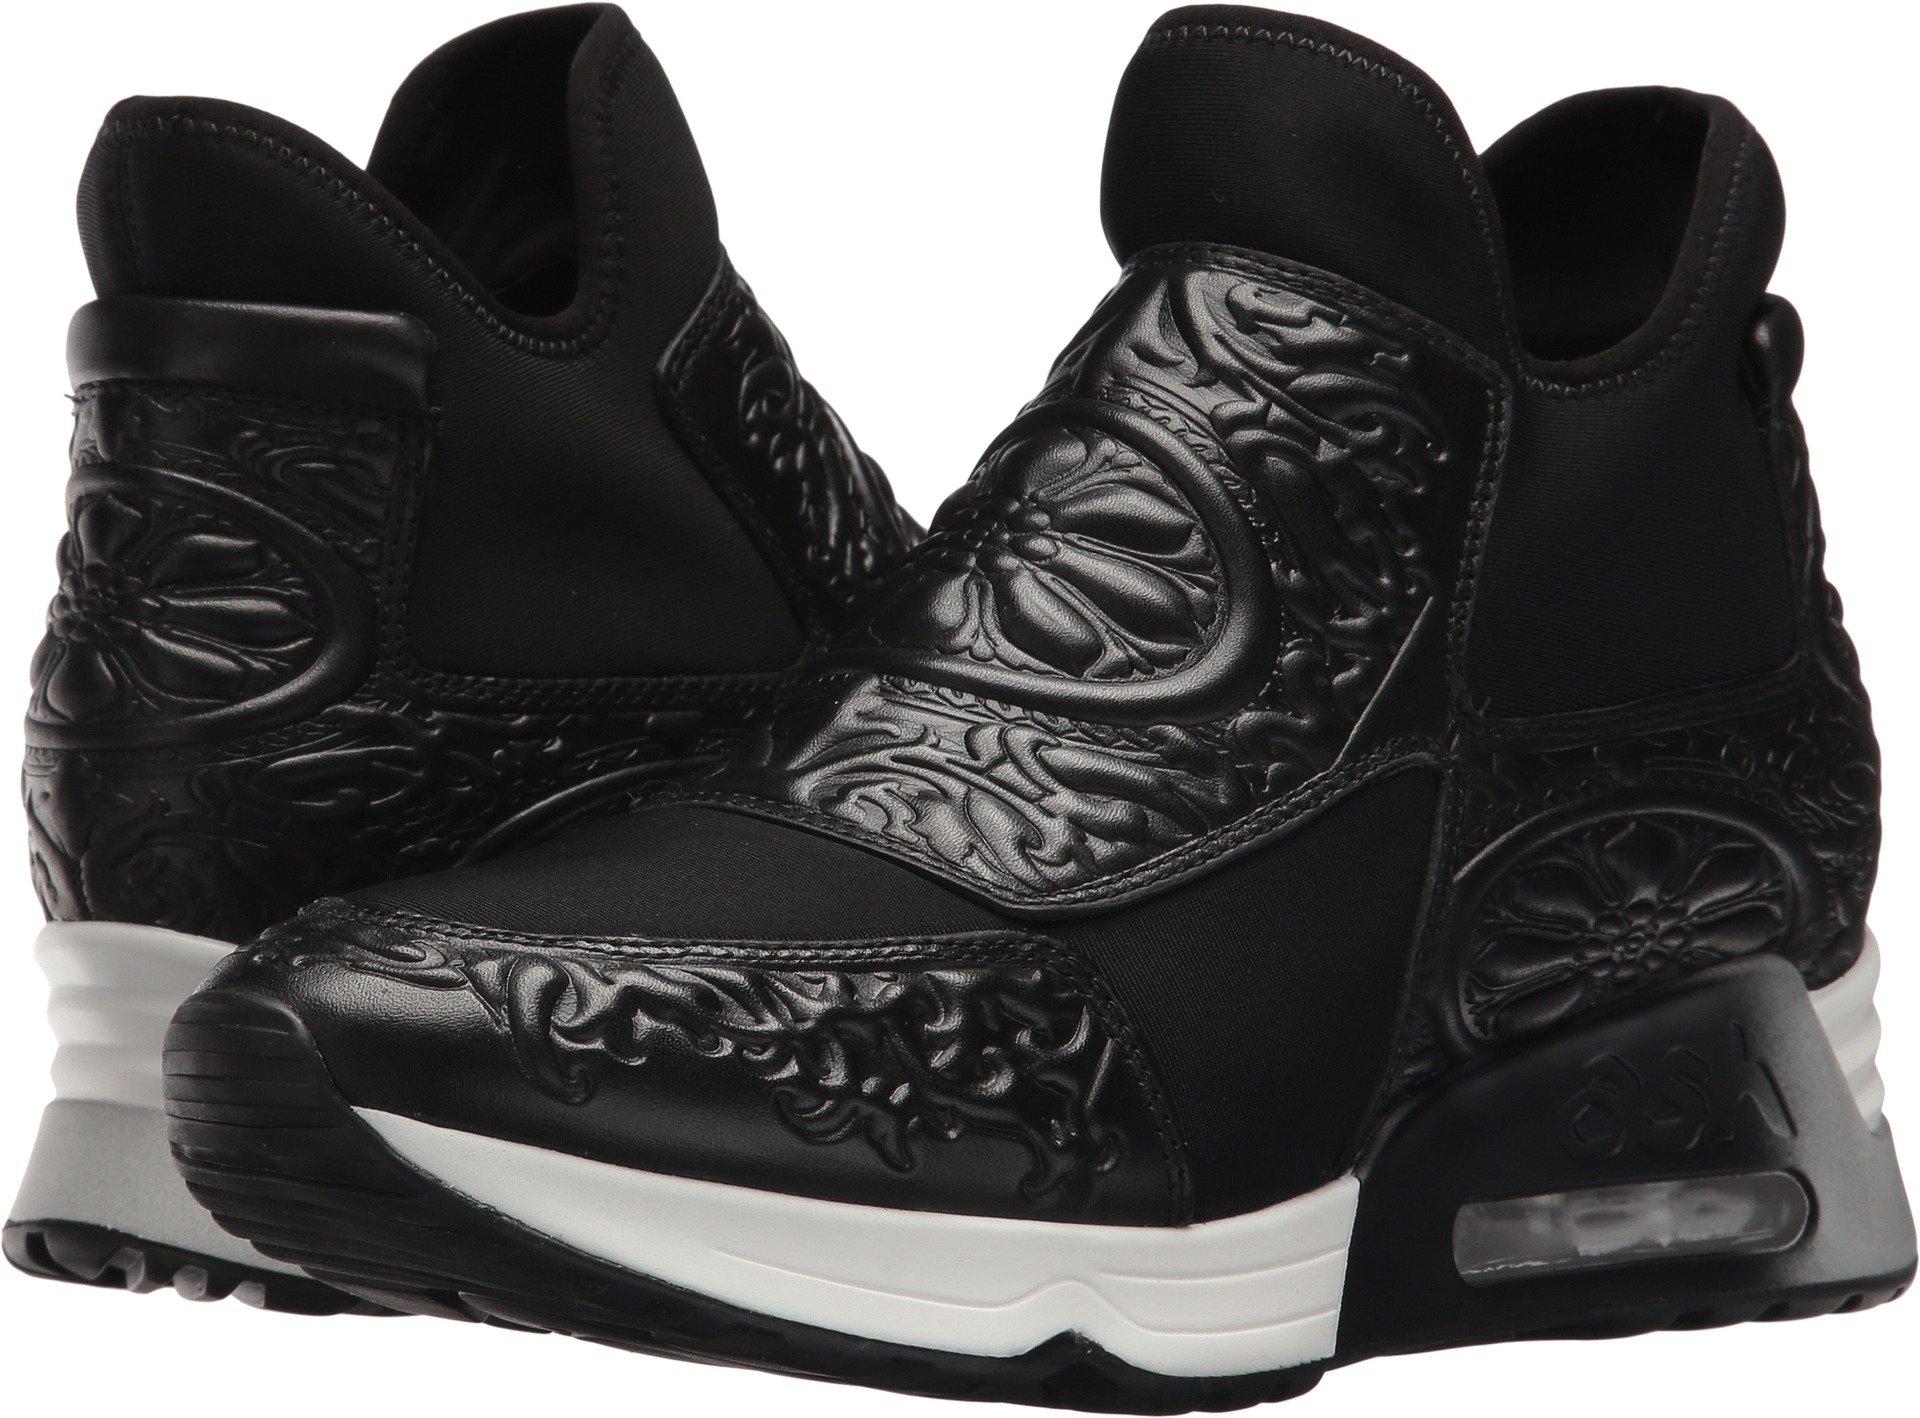 ASH Women's Lexi Black/Black Nappa Calf Lycra Neoprene 38 M EU